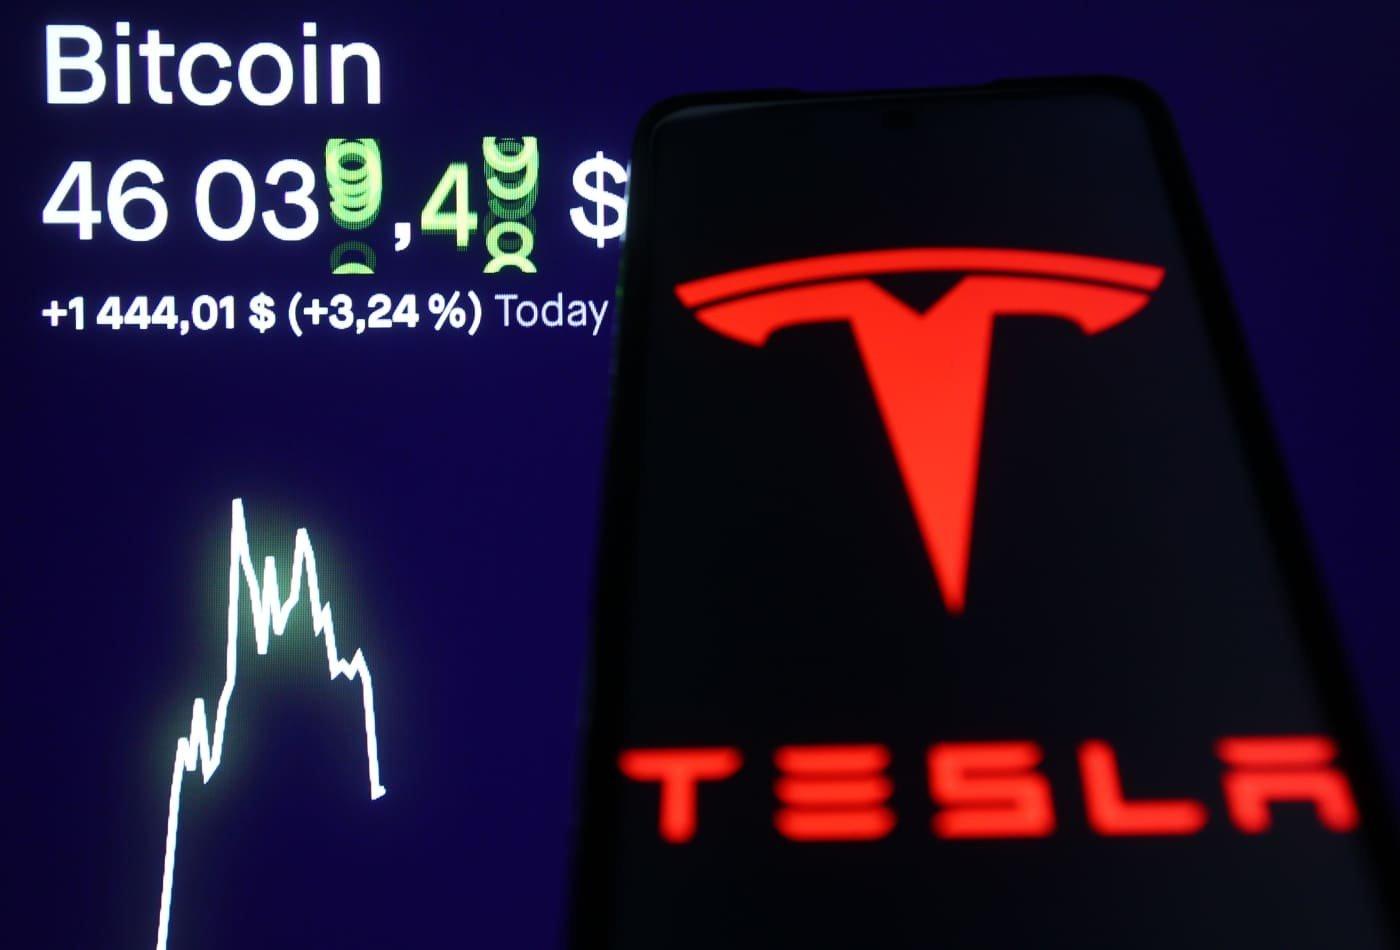 Elon Musk's reversal on bitcoin